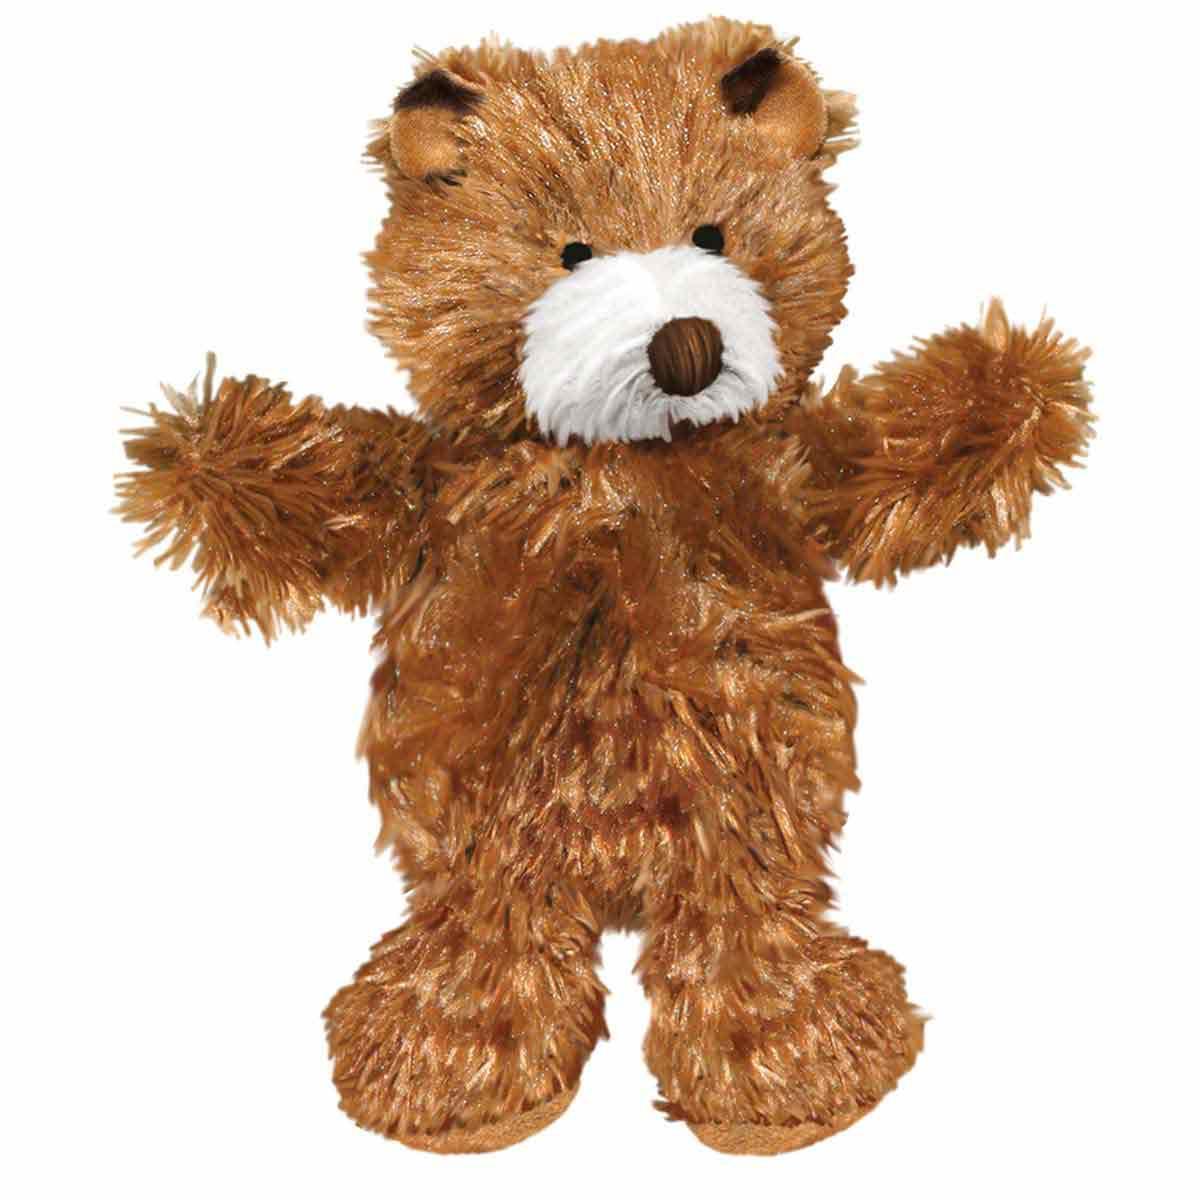 3 inch KONG X-Small Bear